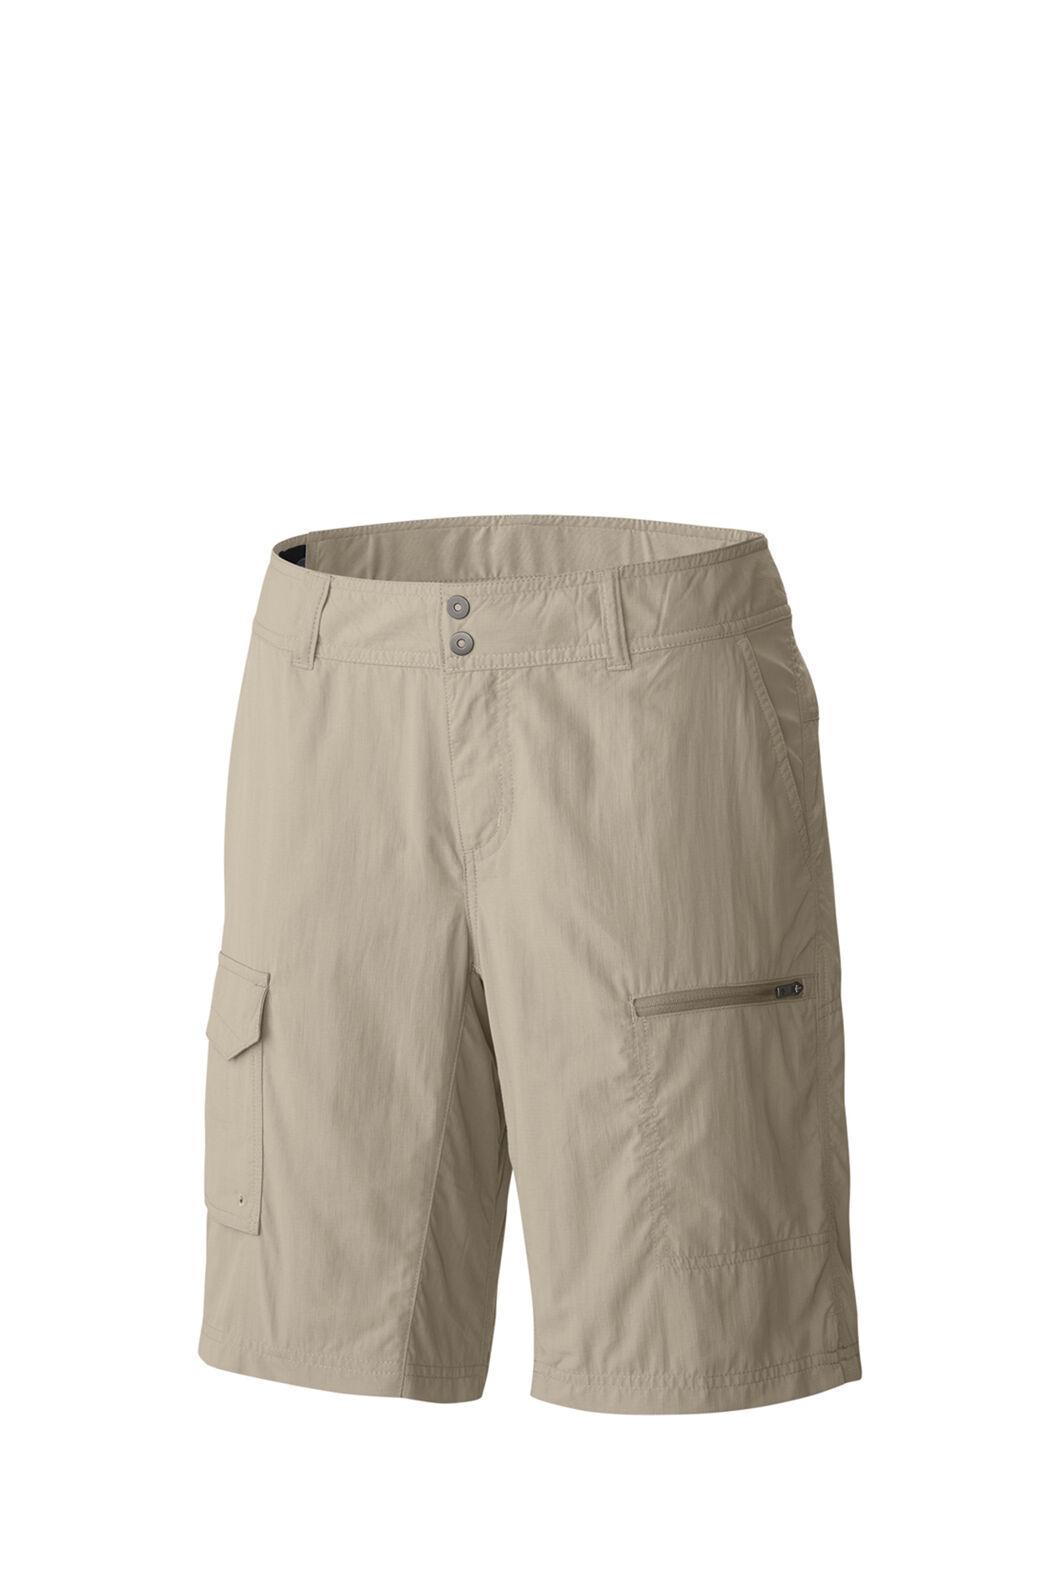 Columbia Women's  Ridge Cargo Shorts, Fossil, hi-res